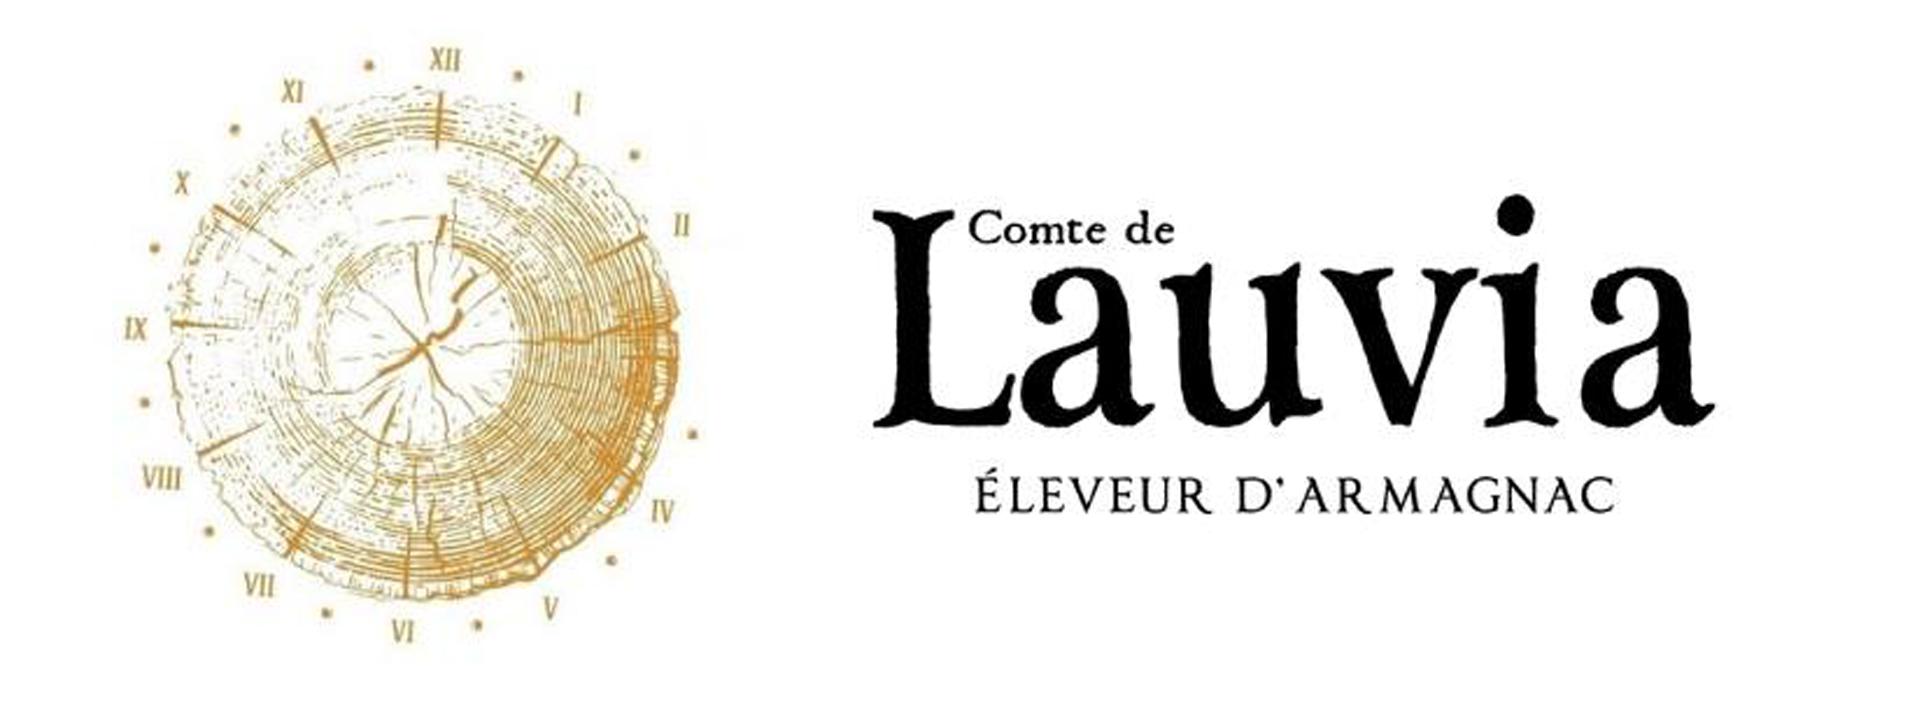 Comte de Lauvia Armagnac